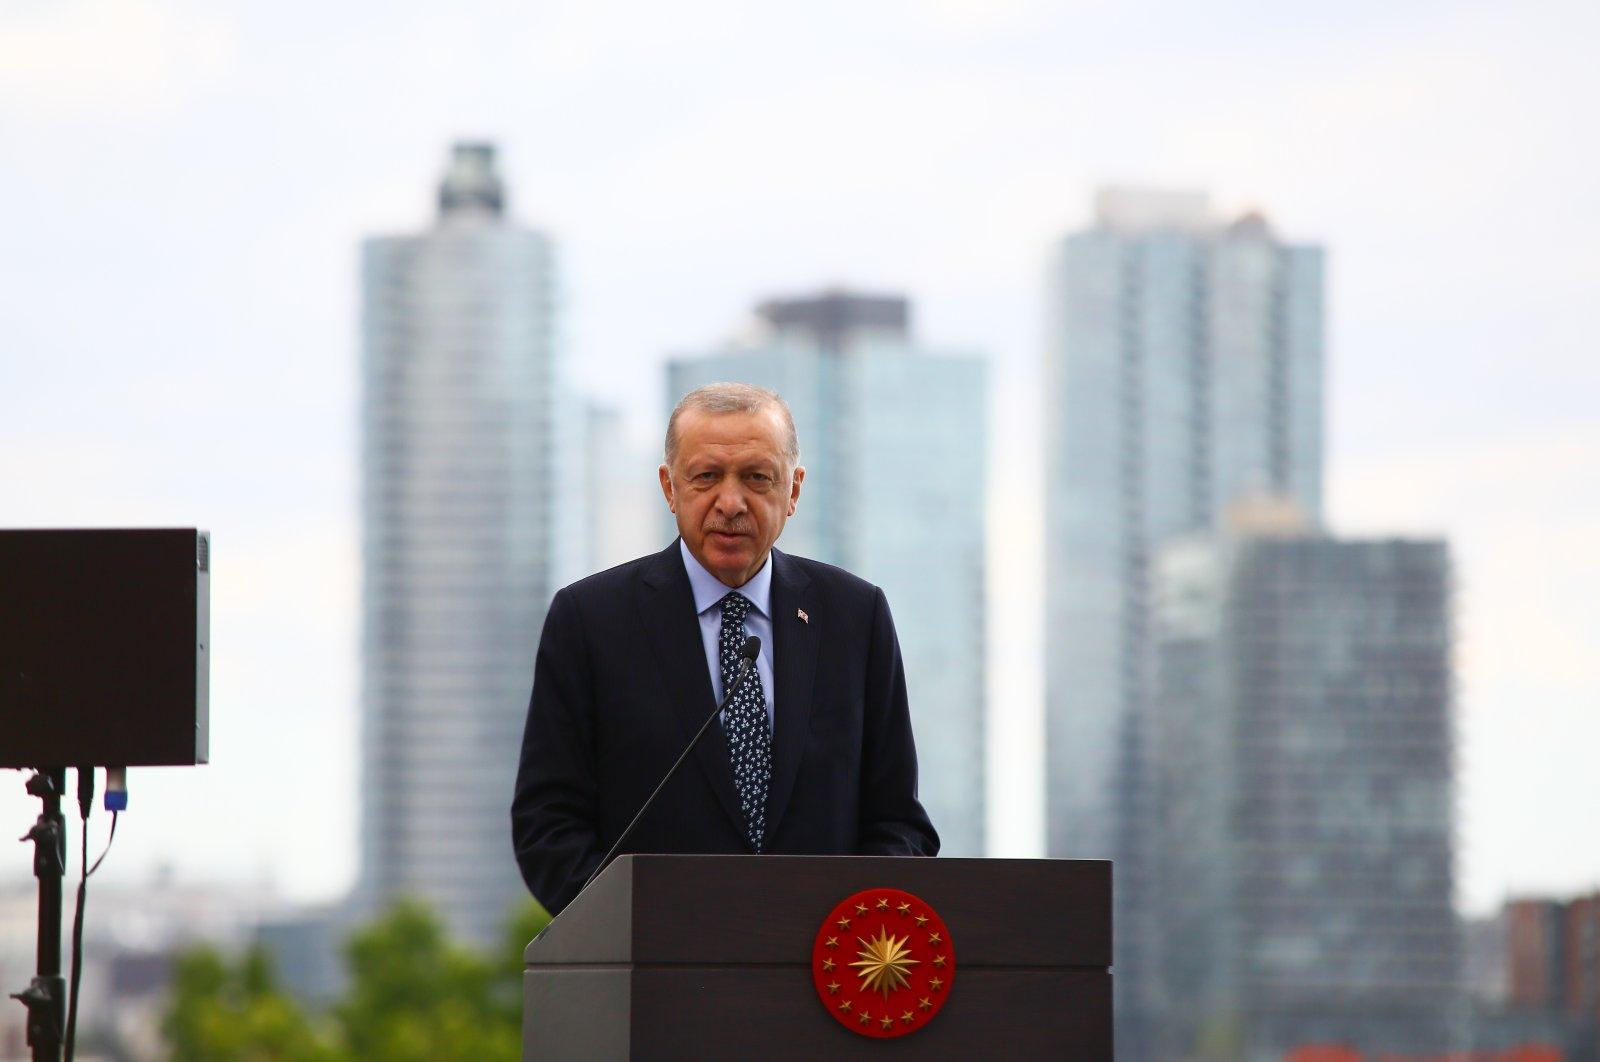 President Recep Tayyip Erdoğan speaks at the opening ceremony of Türkevi (Turkish House) in New York, U.S., Sept. 20, 2021. (İHA Photo)